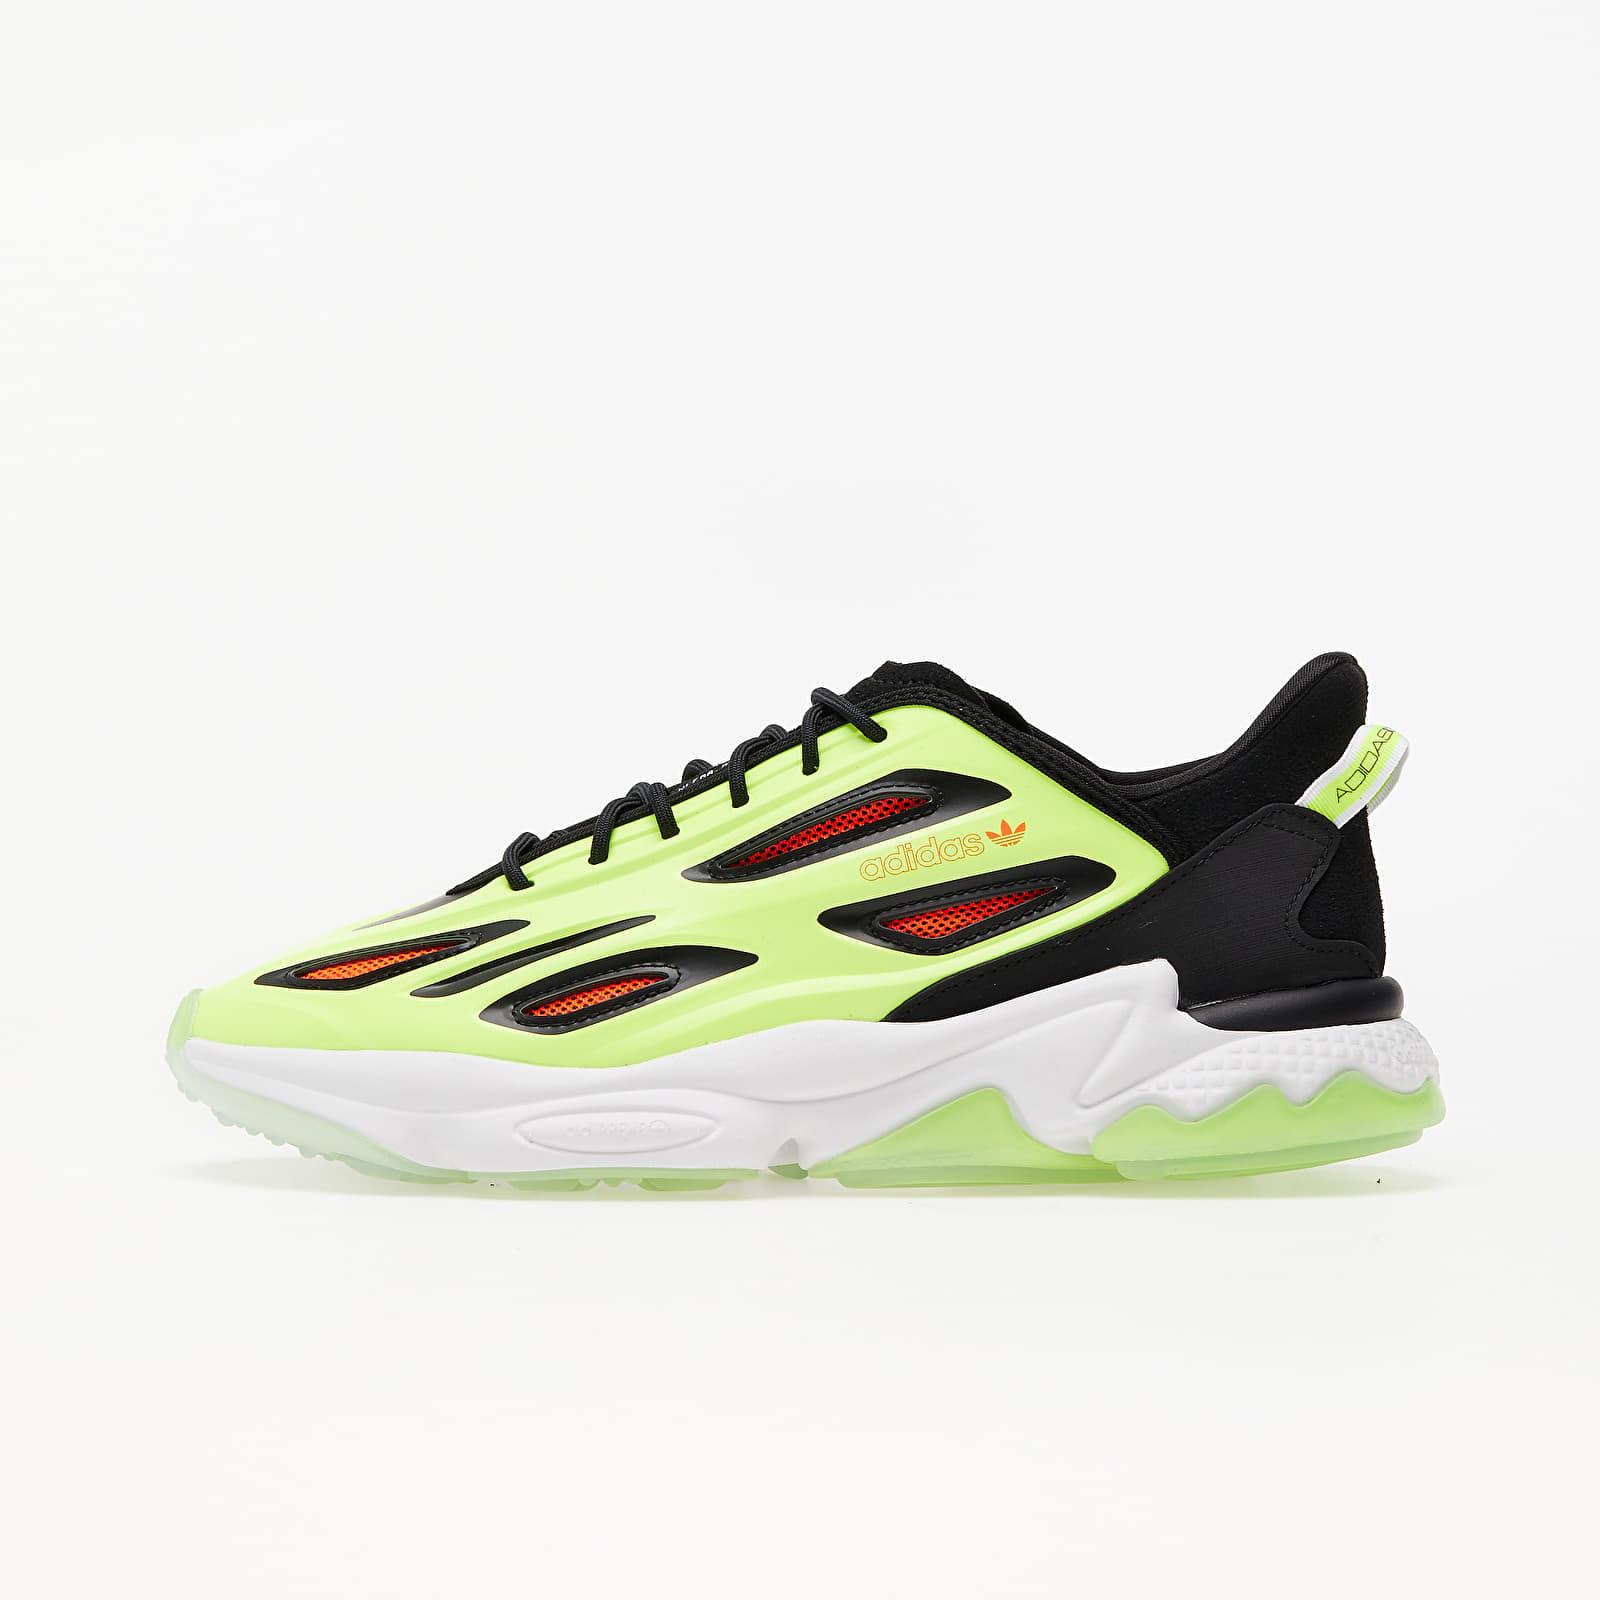 adidas Ozweego Celox Core Black/ Solar Yellow/ Solar Red EUR 42